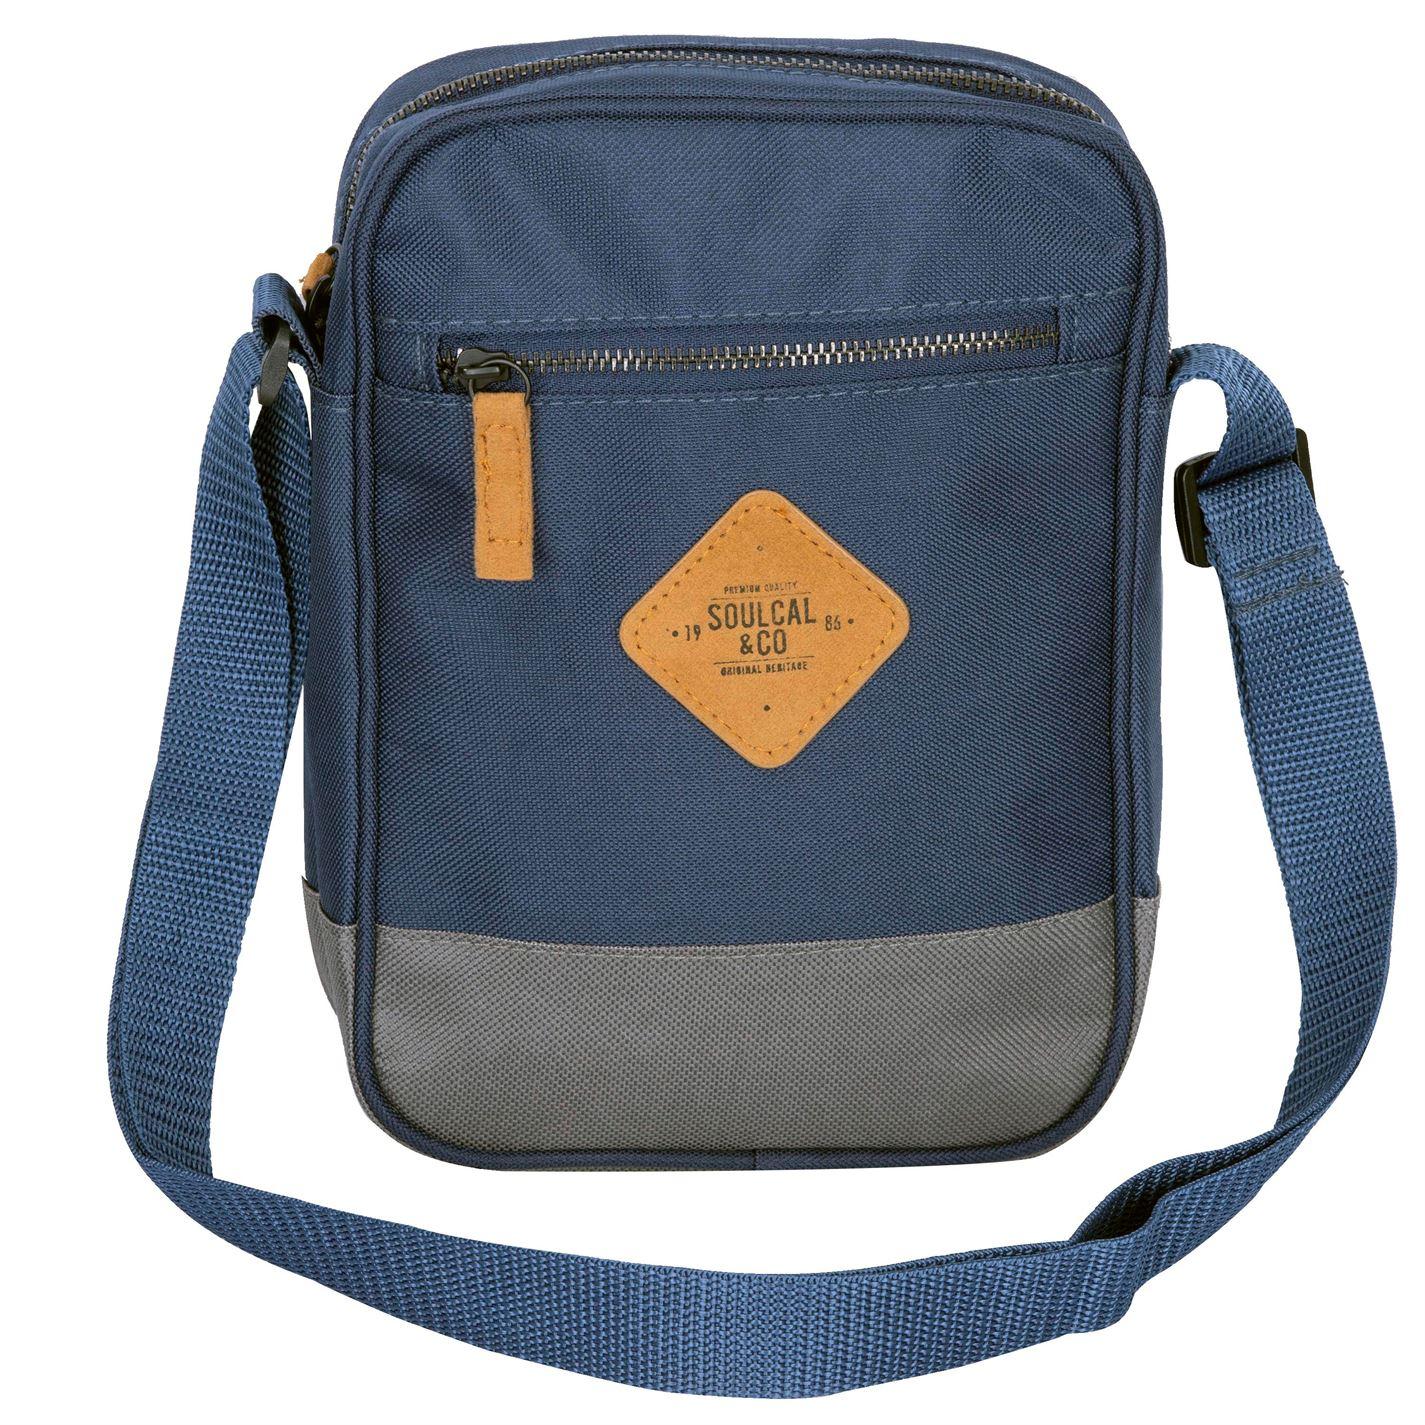 Unisex-SoulCal-Mini-Gadget-Bag-Zip-New thumbnail 10